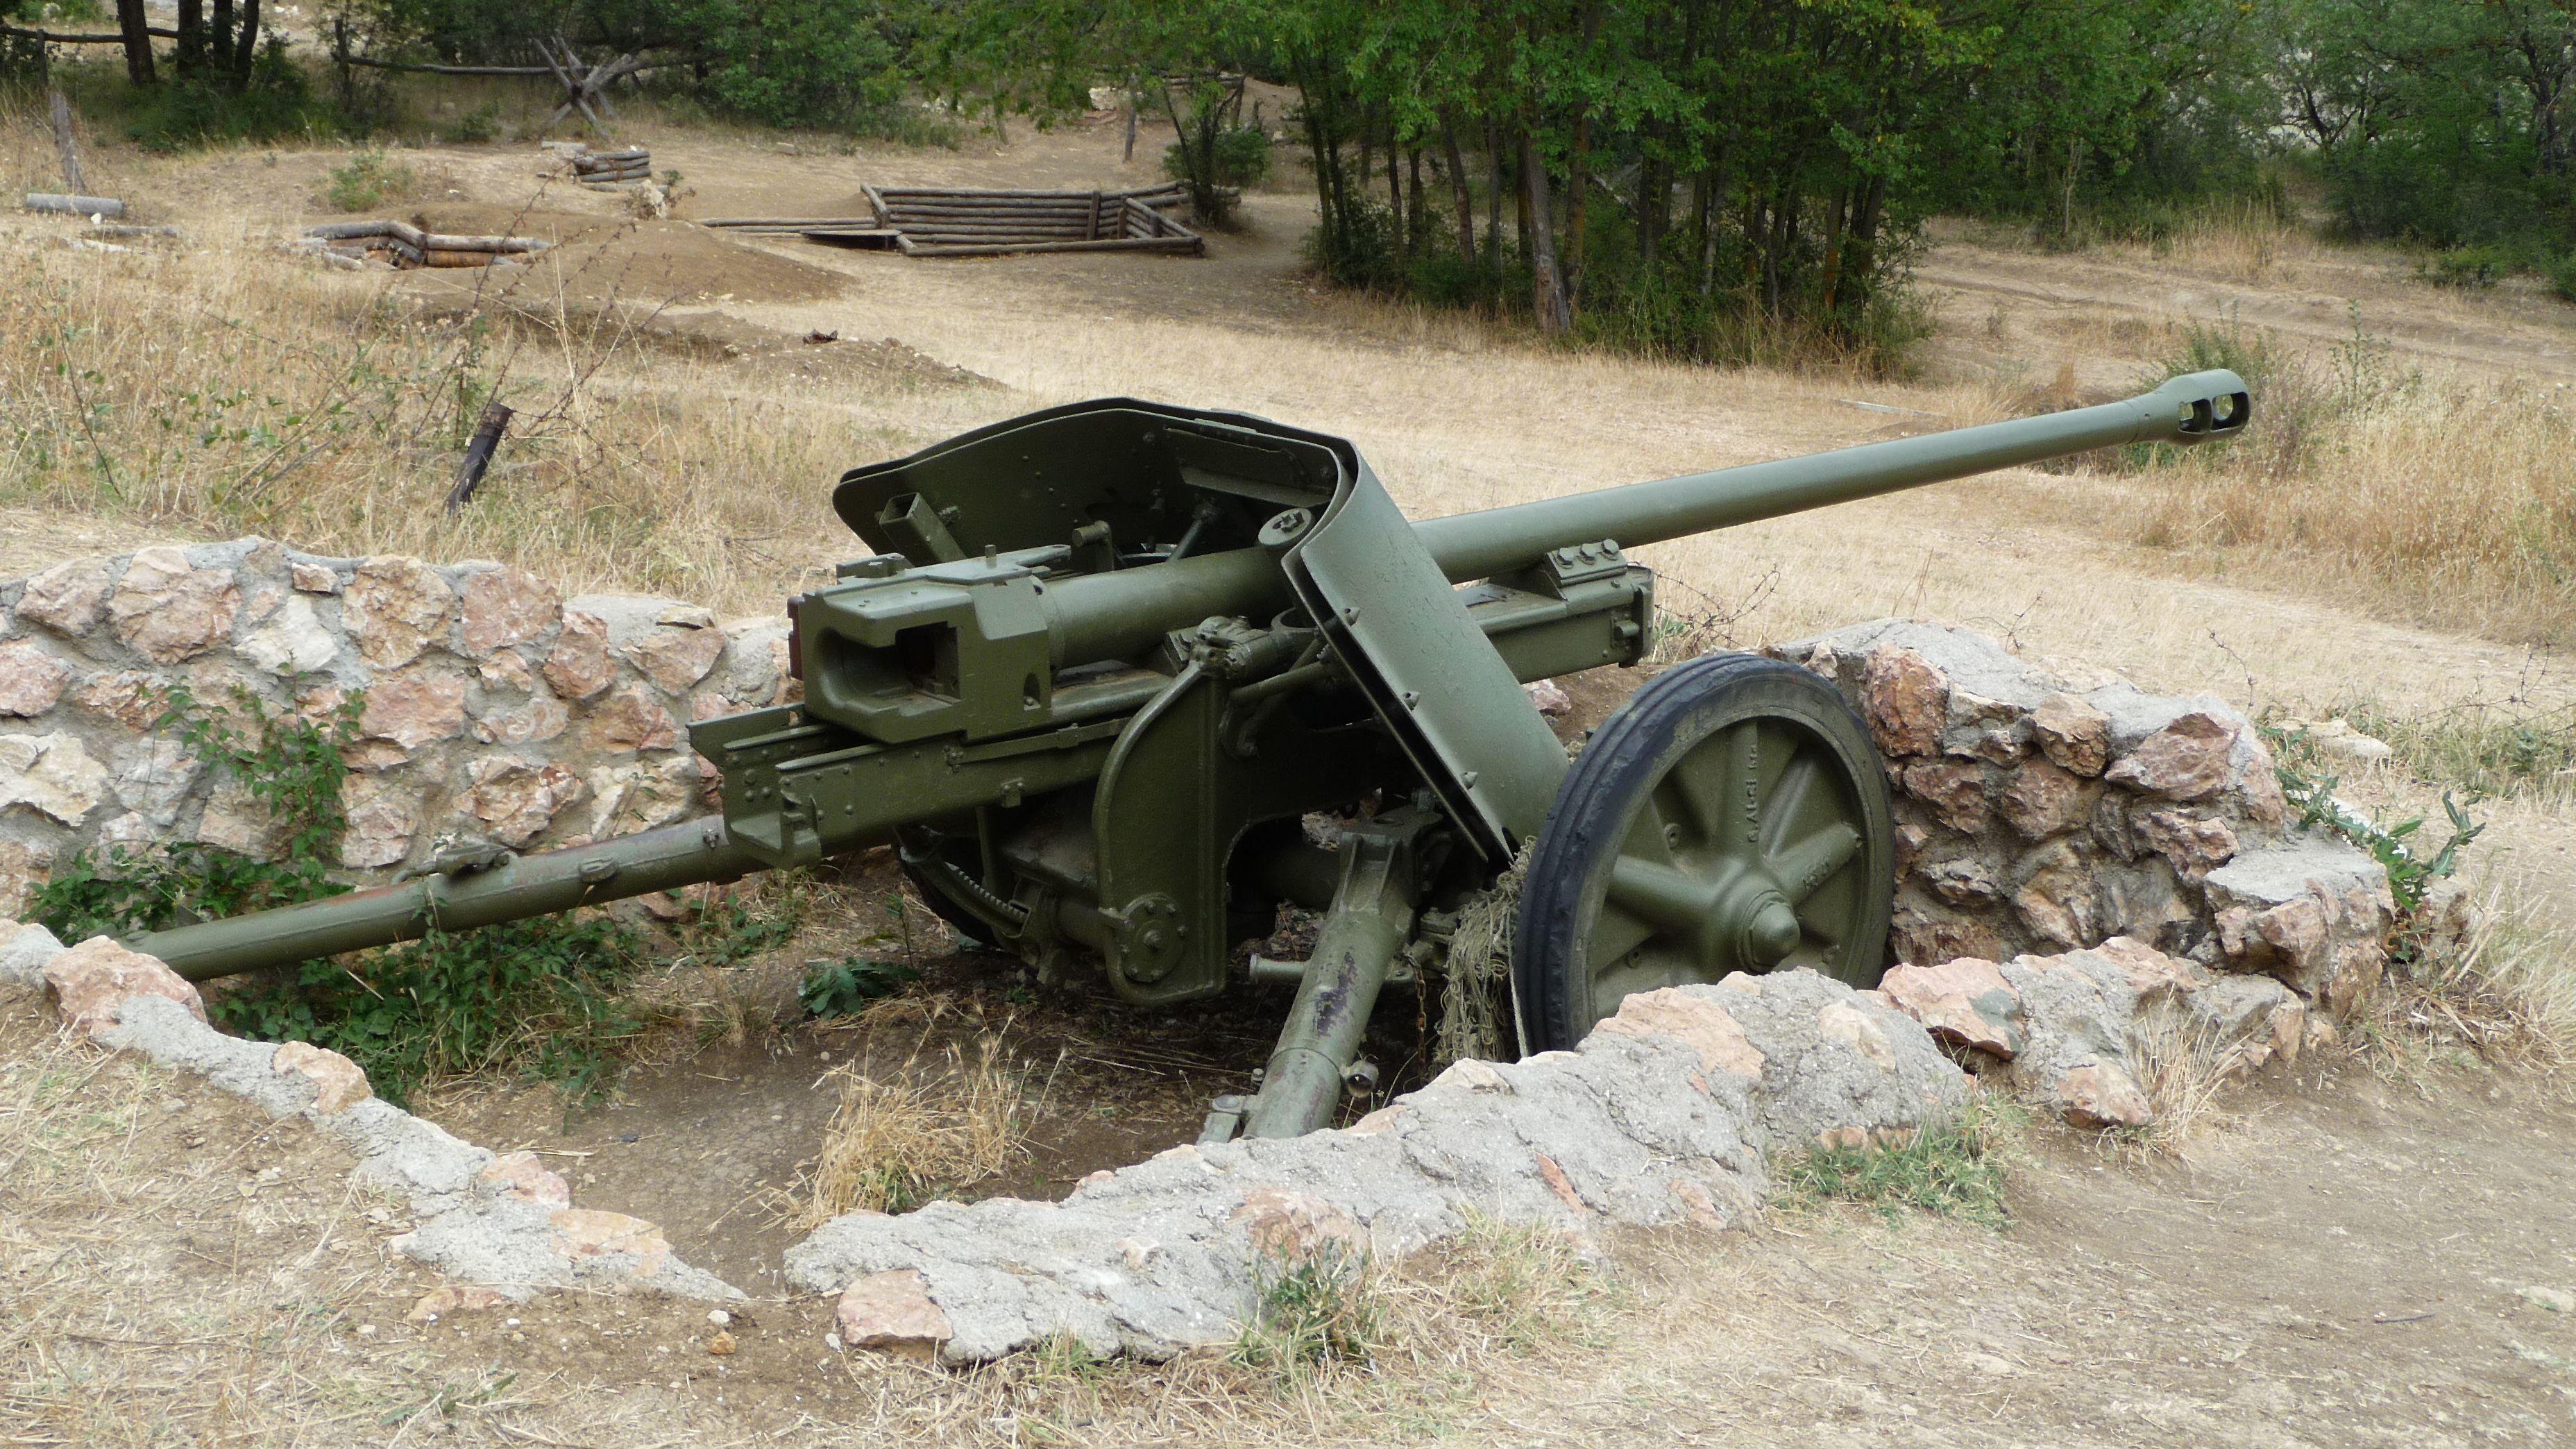 German 50 Mm Anti Tank Gun: Pak-38 L/60 (50mm): When The Germans Faced Soviet Tanks In